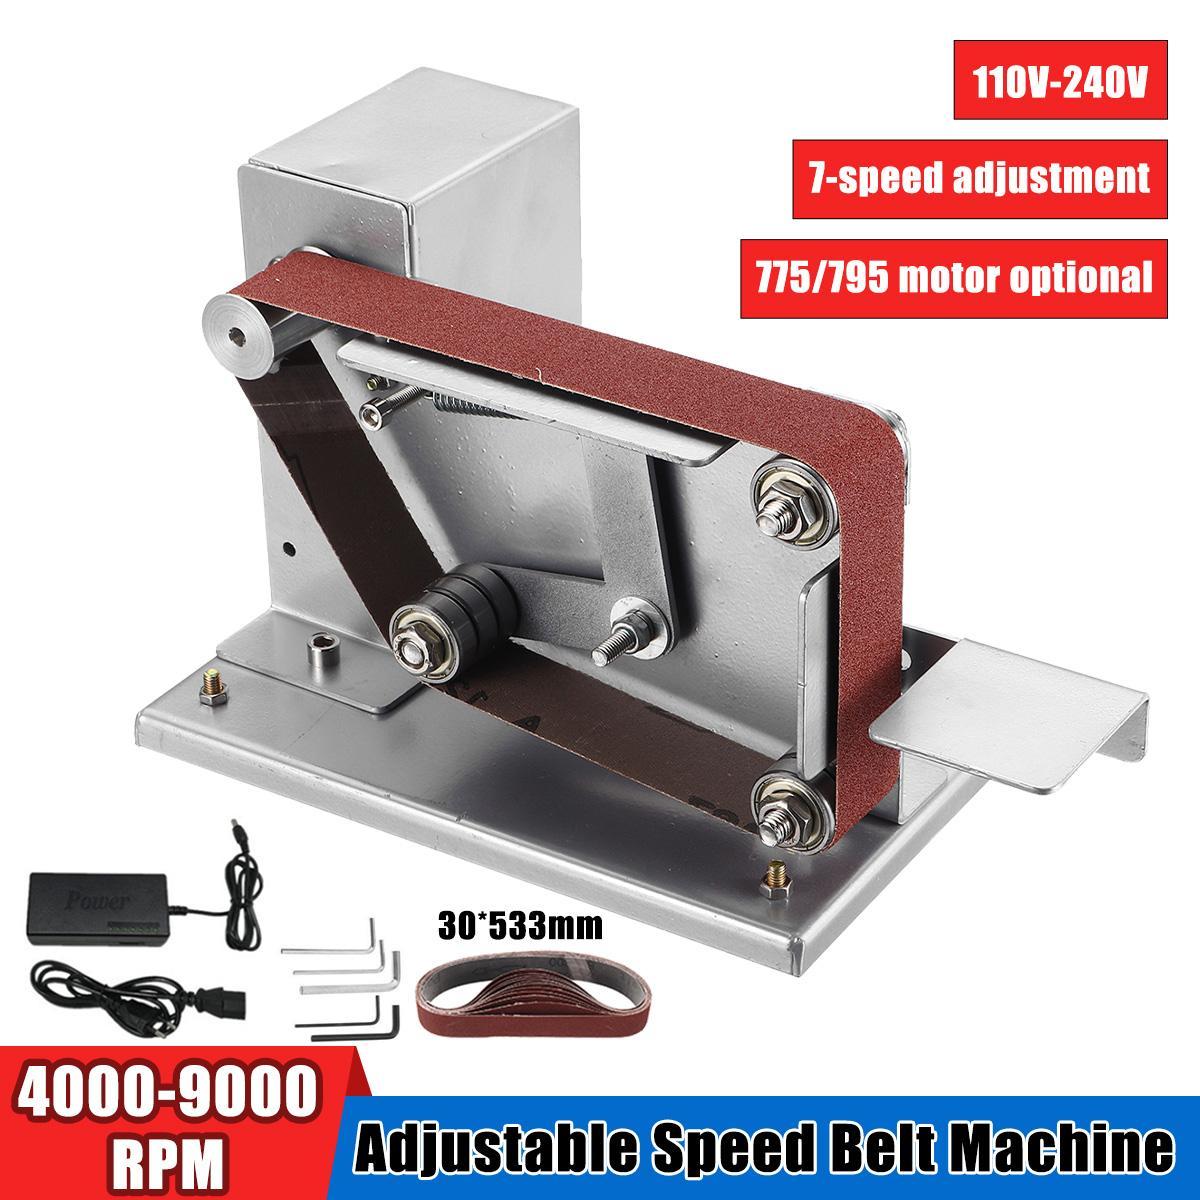 Mini amoladora angular lijadora de banda eléctrica con adaptador de 3cm pulidora cortadora de bordes afilador Correa amoladora 110/220V